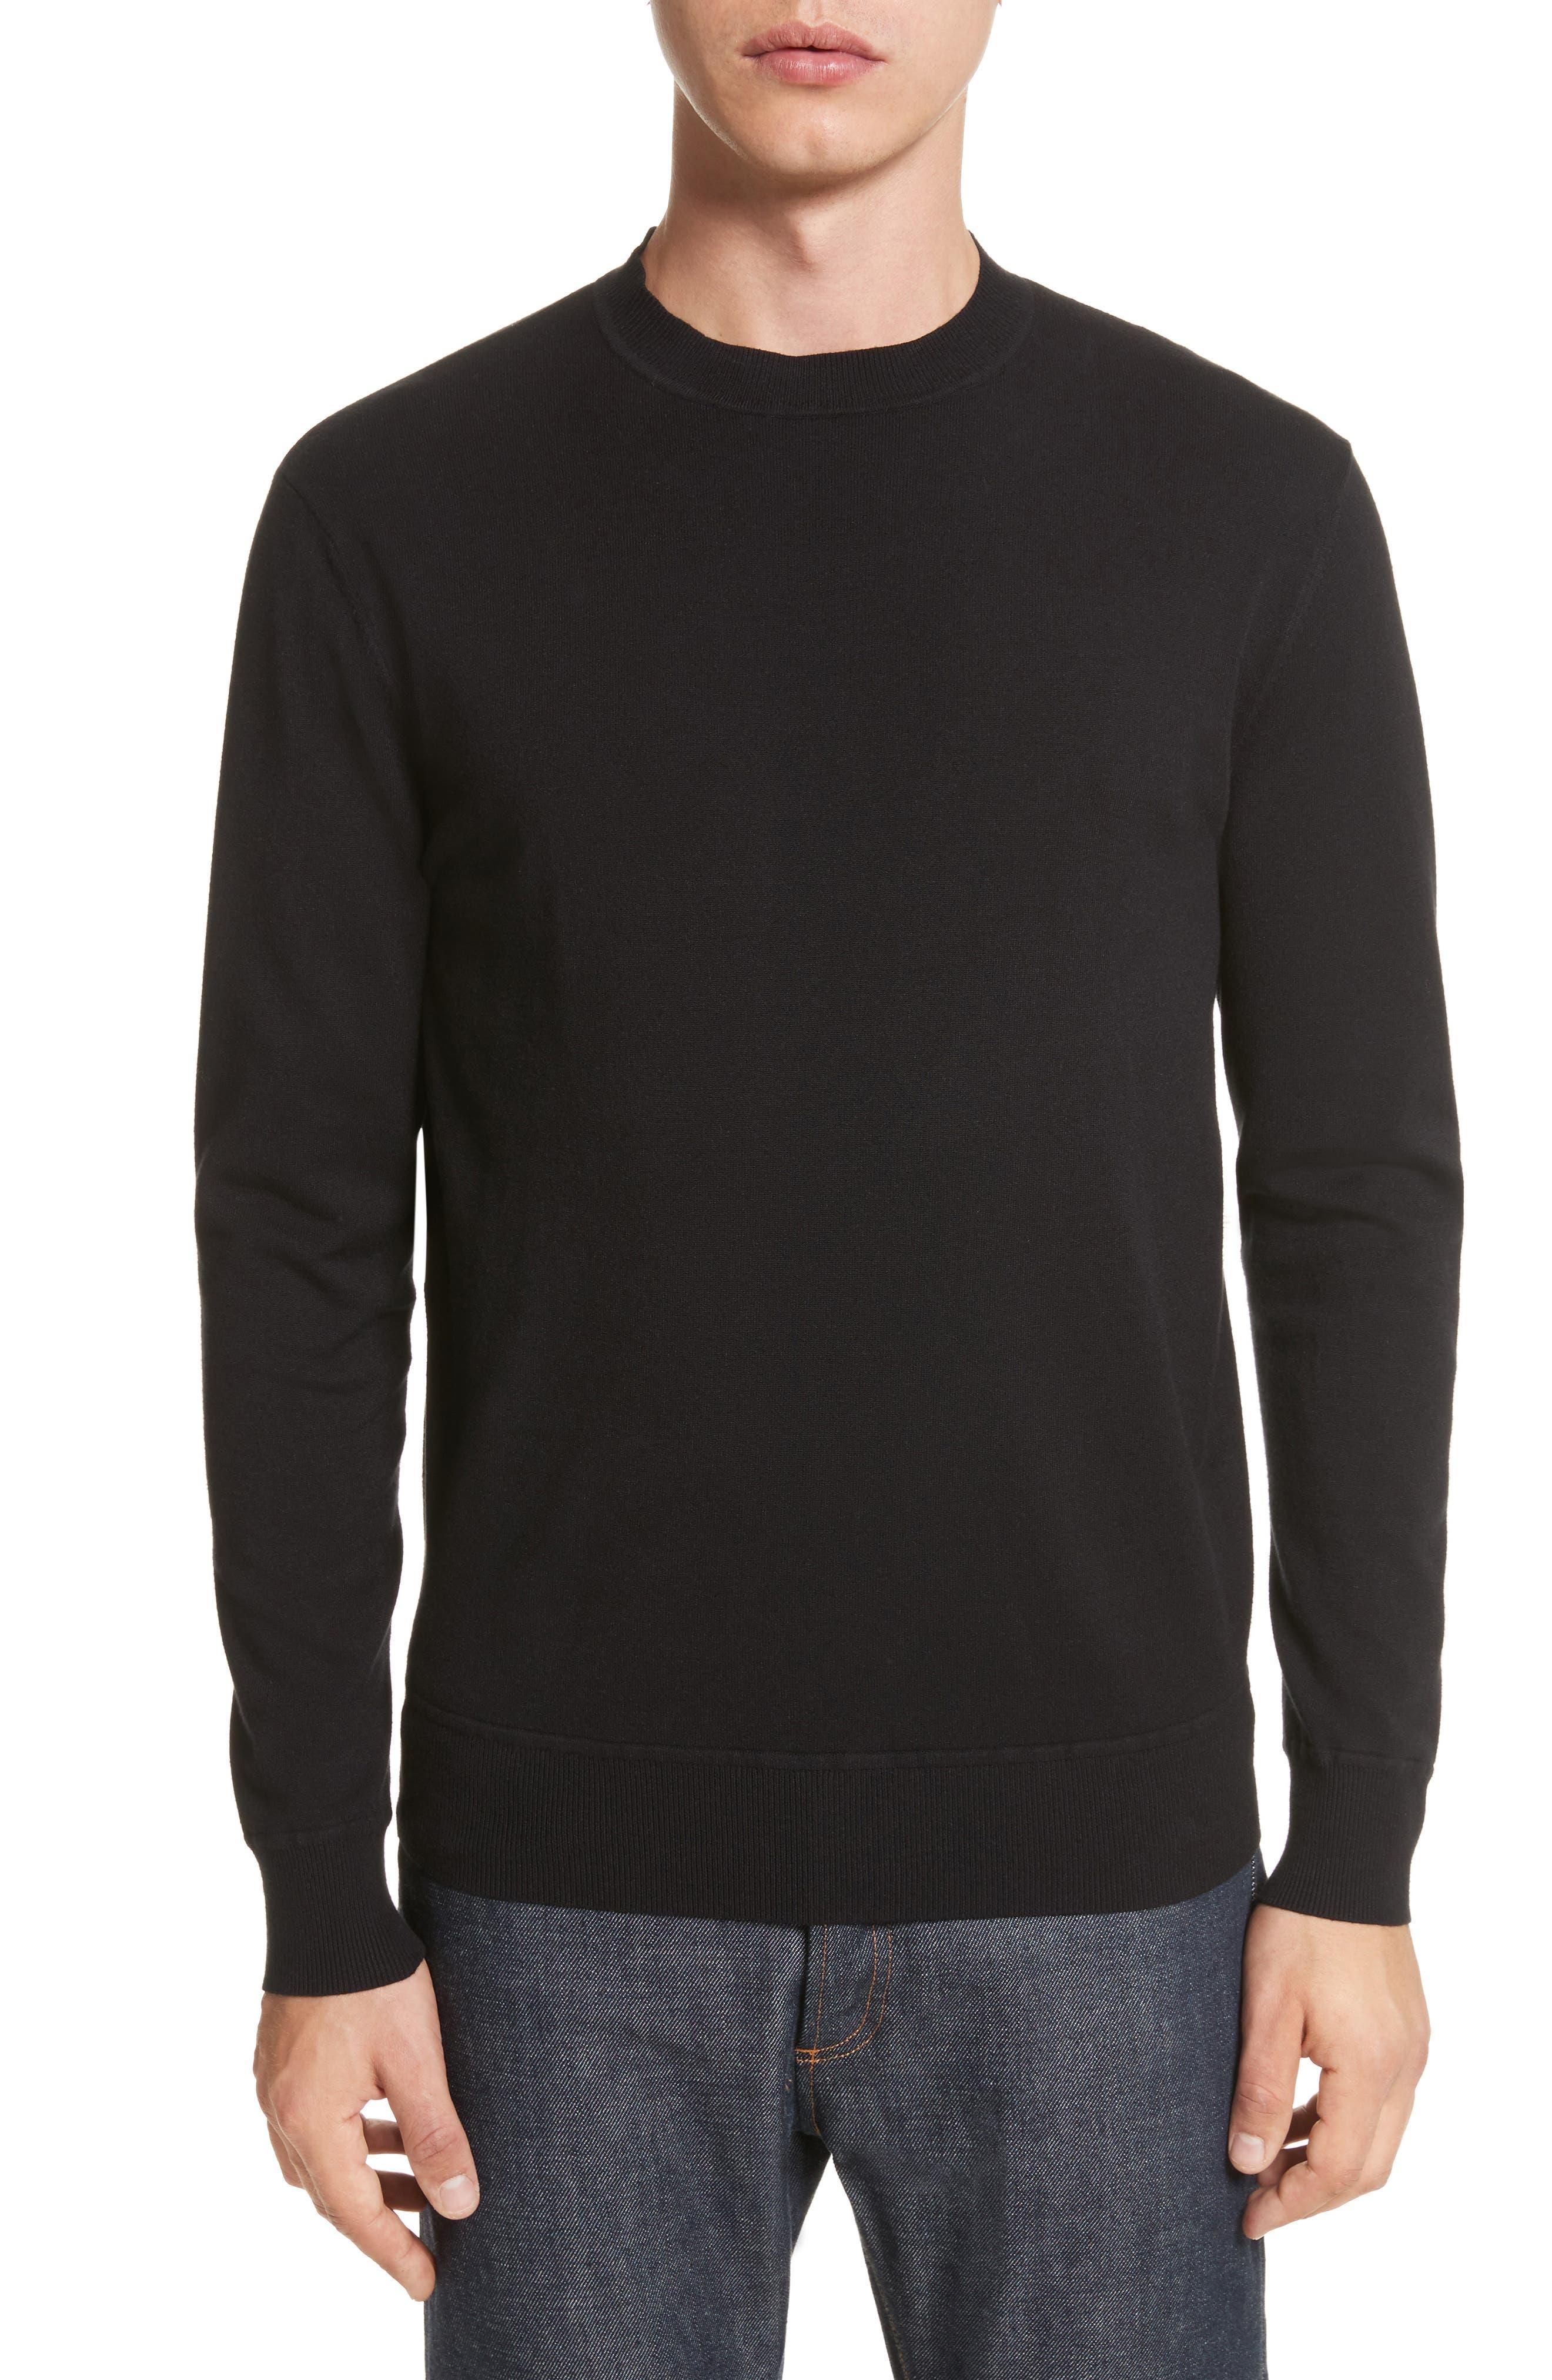 Ronnie Crewneck Sweatshirt,                             Main thumbnail 1, color,                             Black